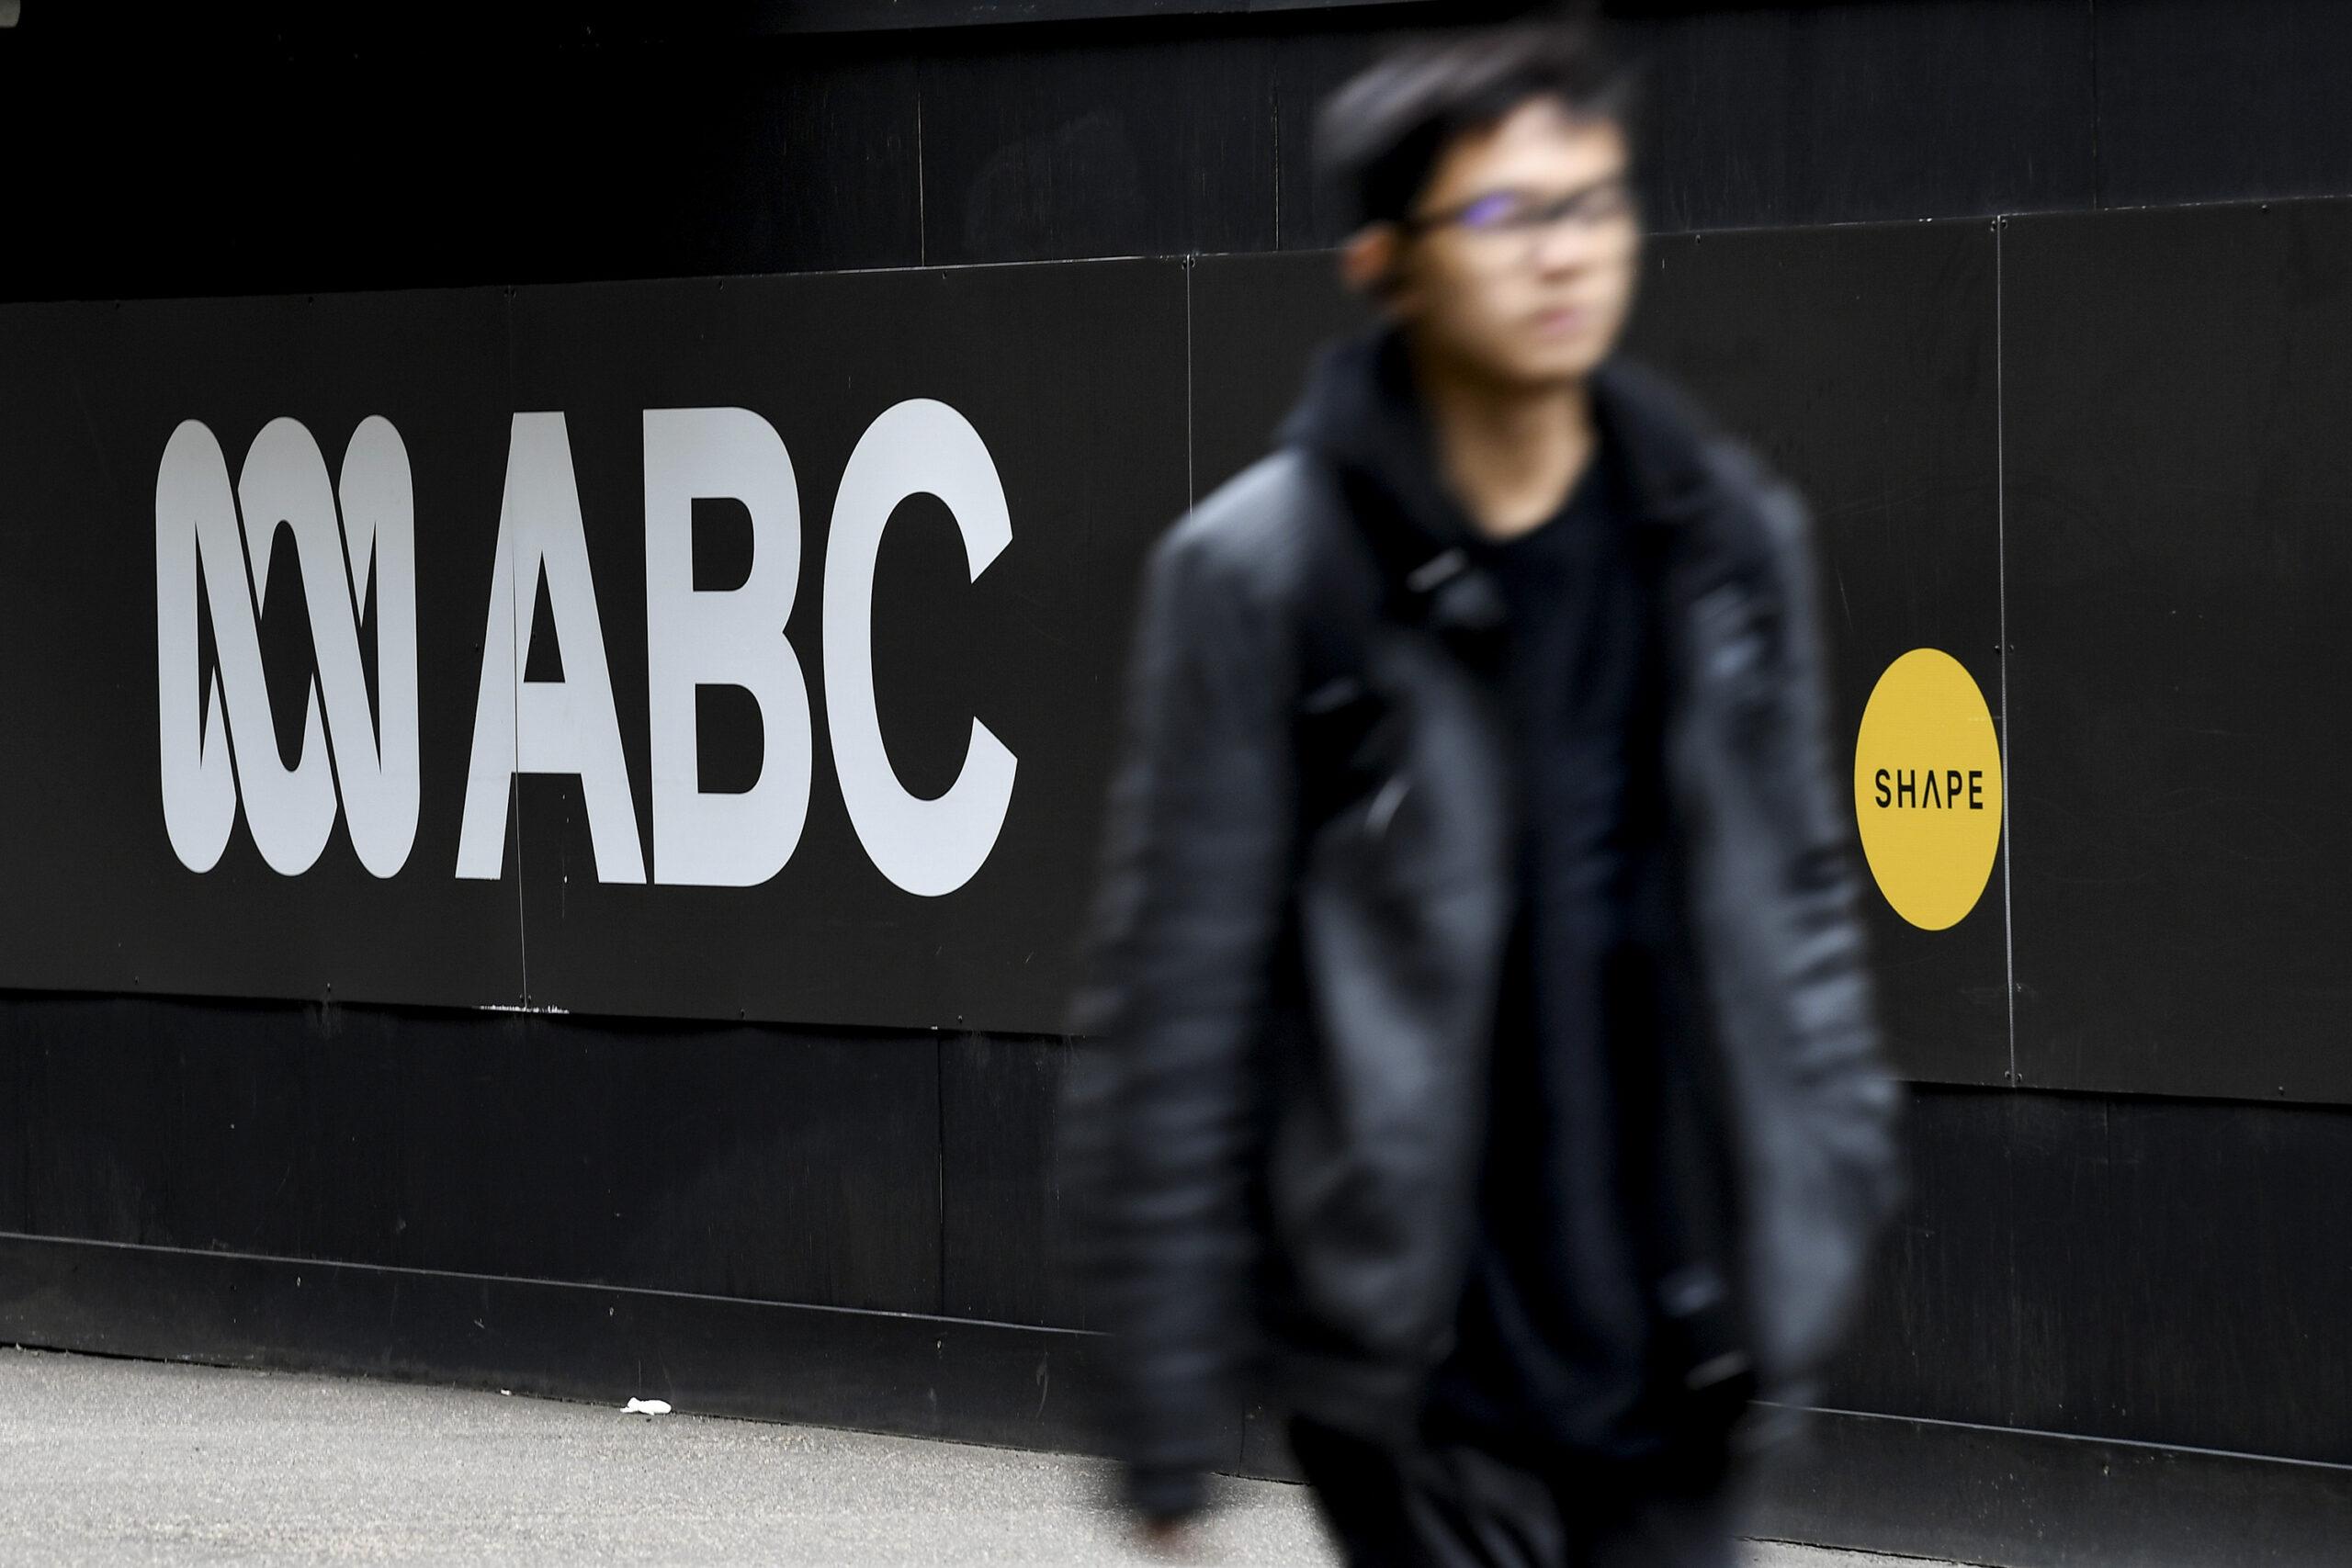 Australian Broadcasting Corporation Wants Permanent News Gathering Funding